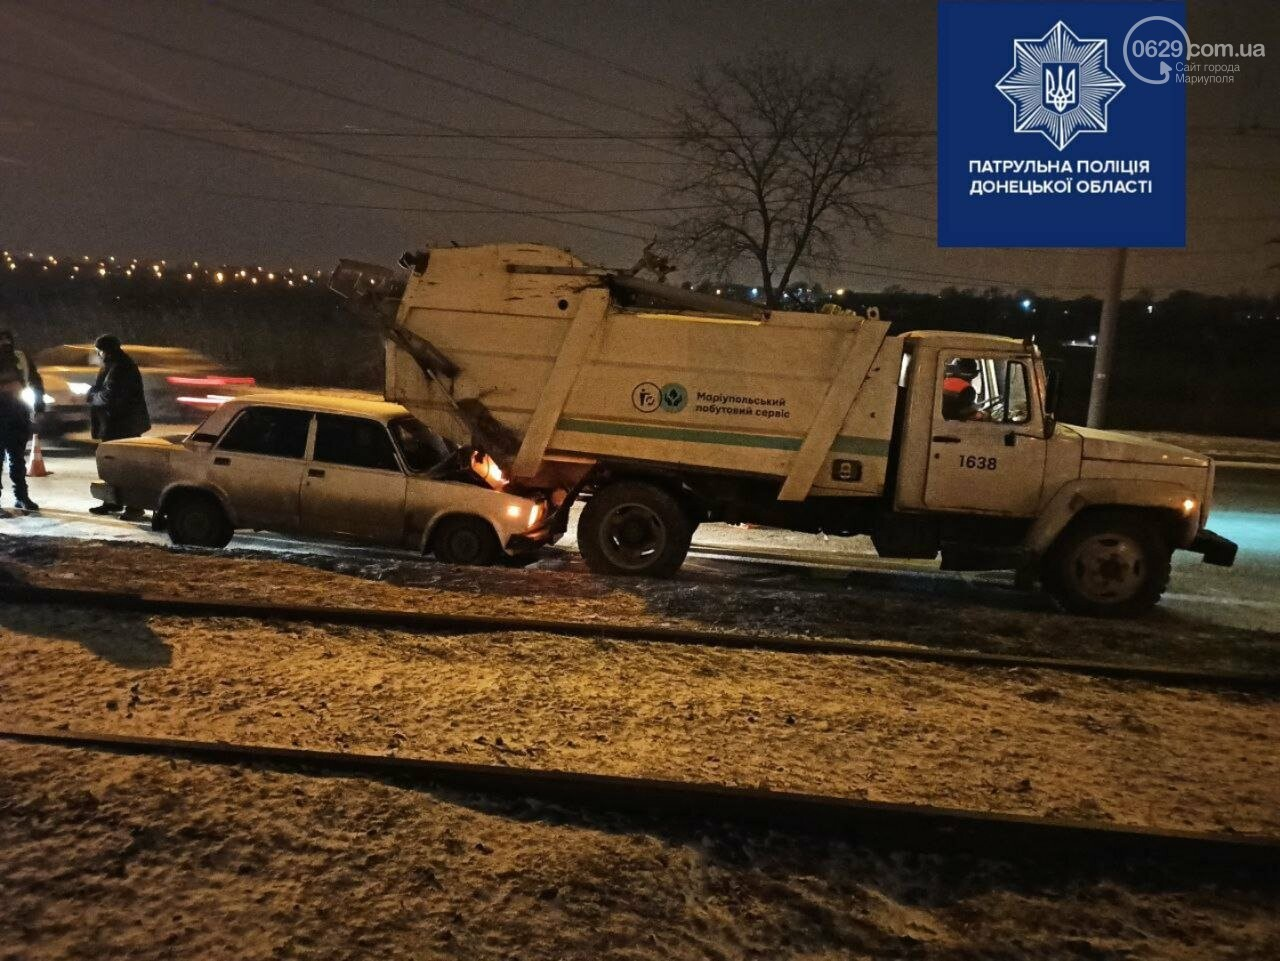 В Мариуполе ВАЗ  на Набережной влетел в мусоровоз, - ФОТО, фото-1